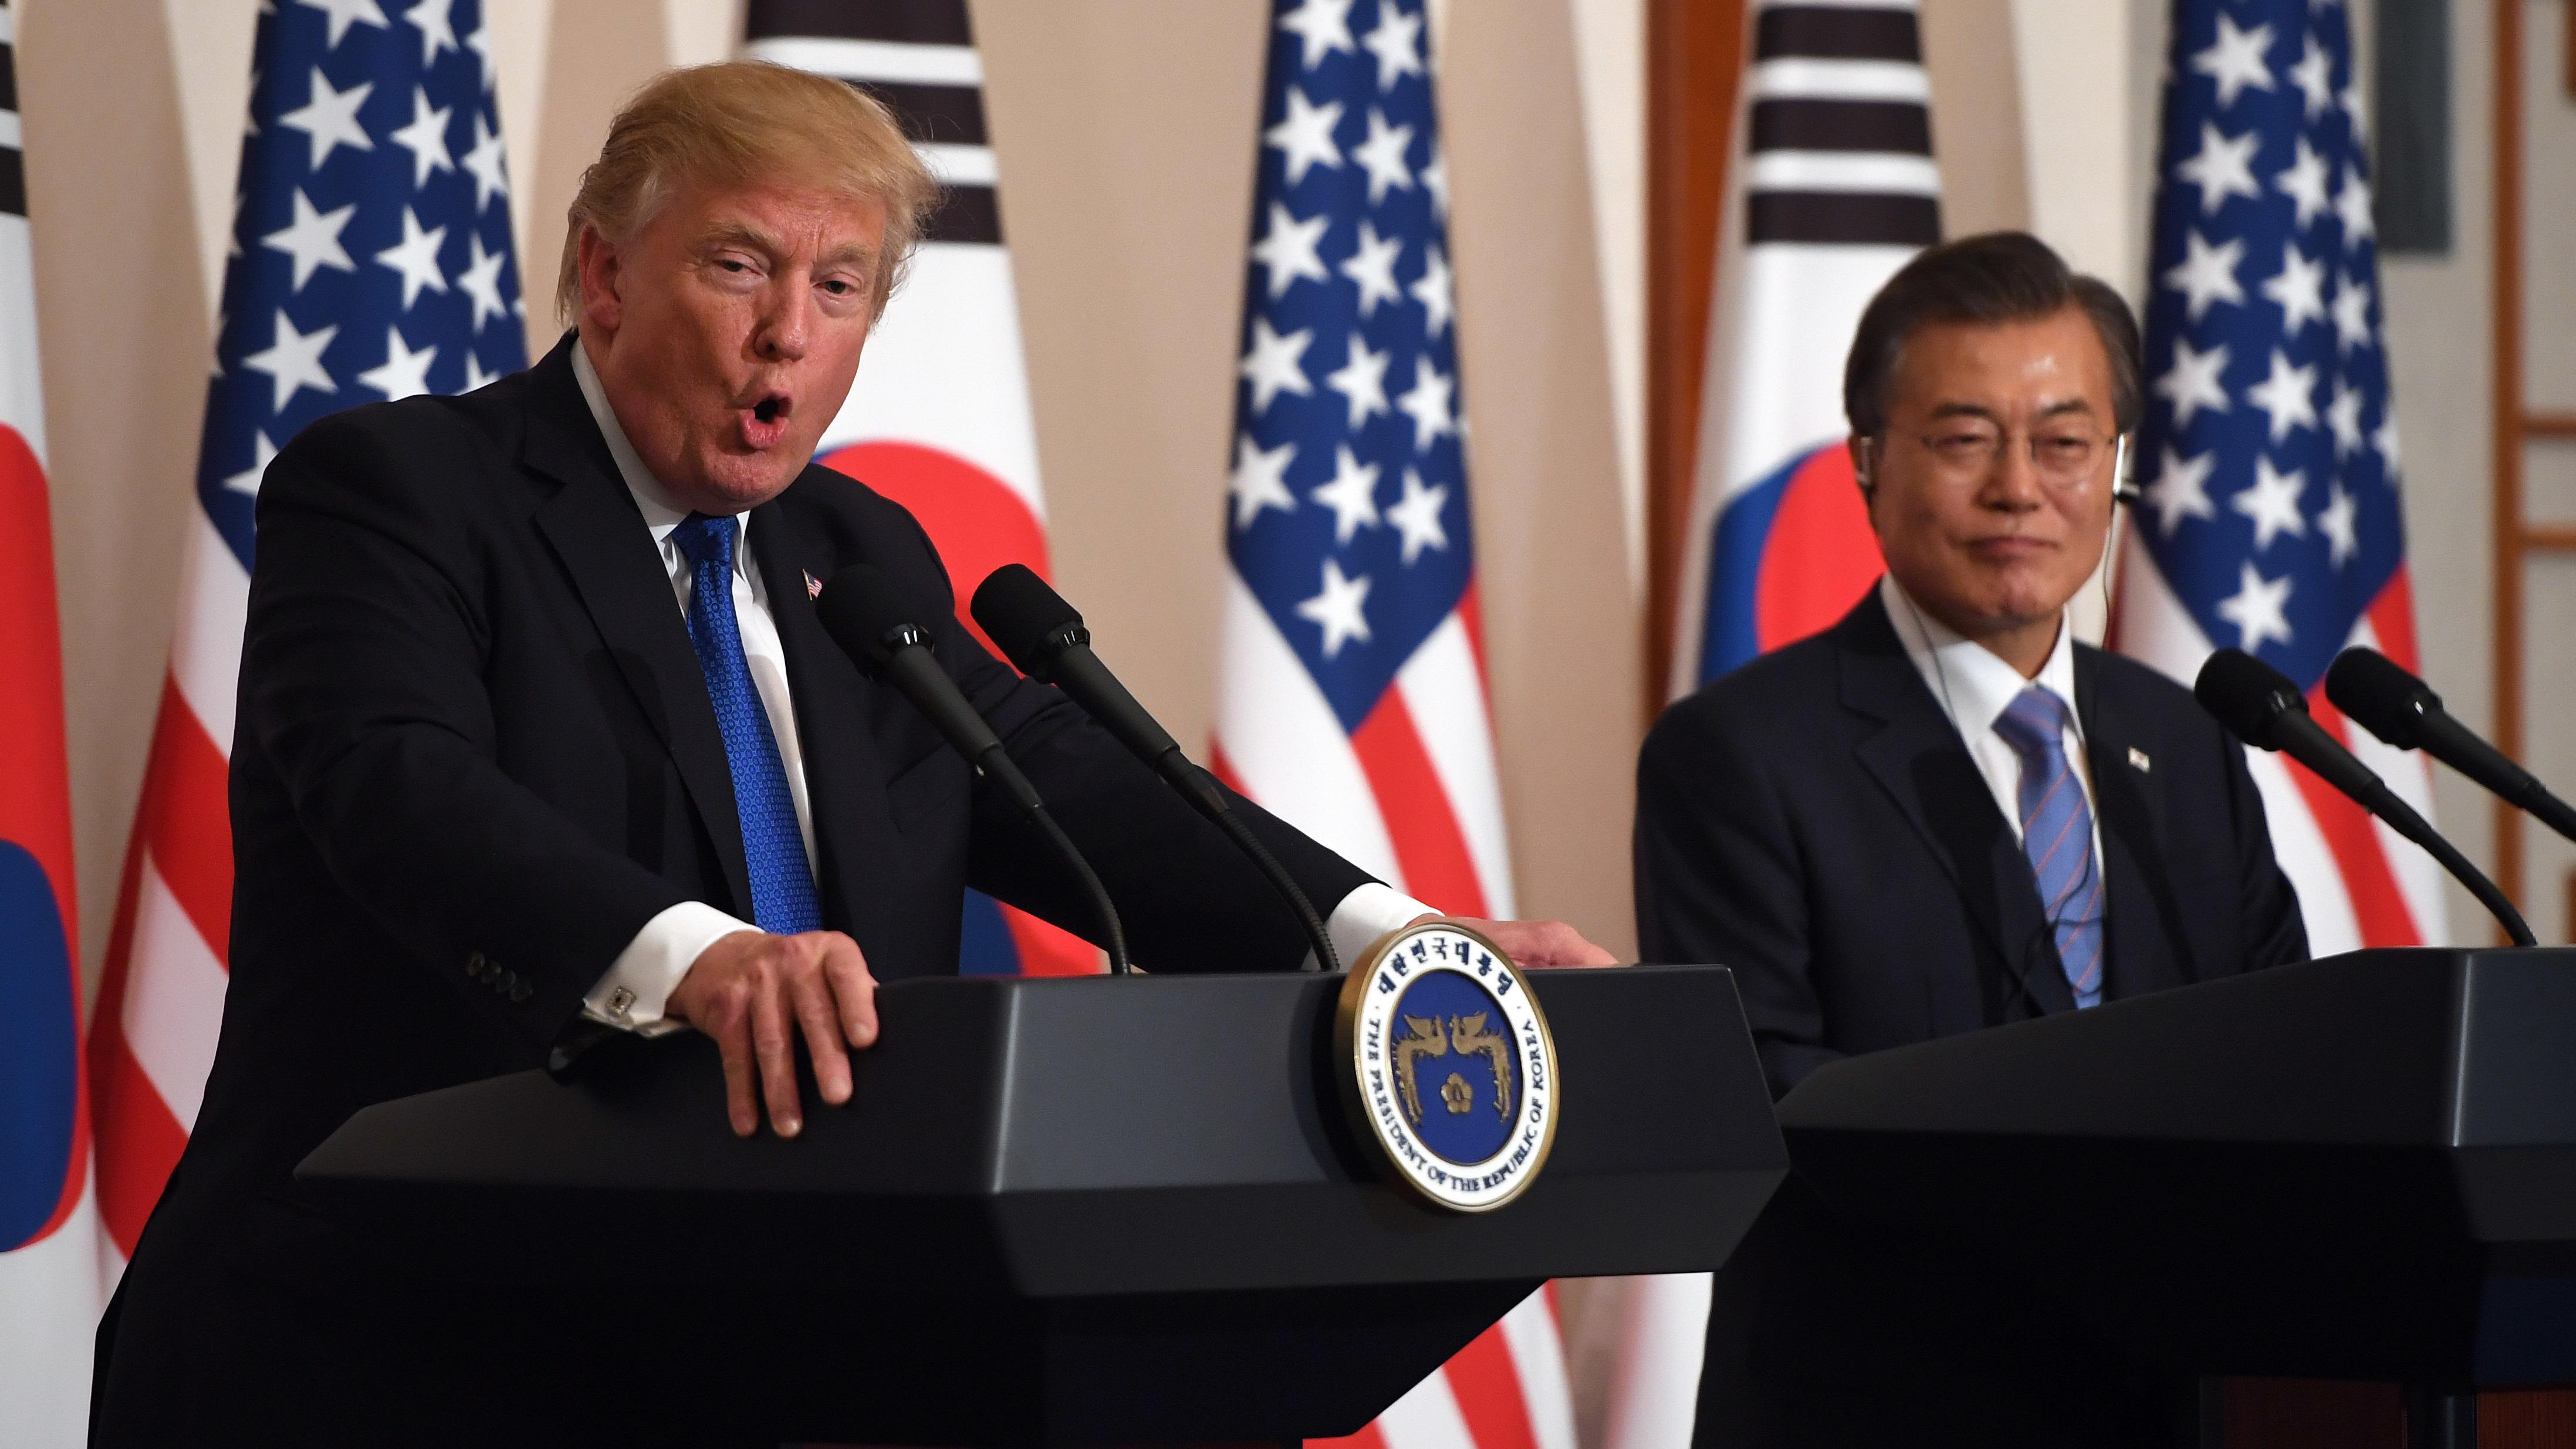 South Korean President Praises Trump: Give that Guy a Nobel